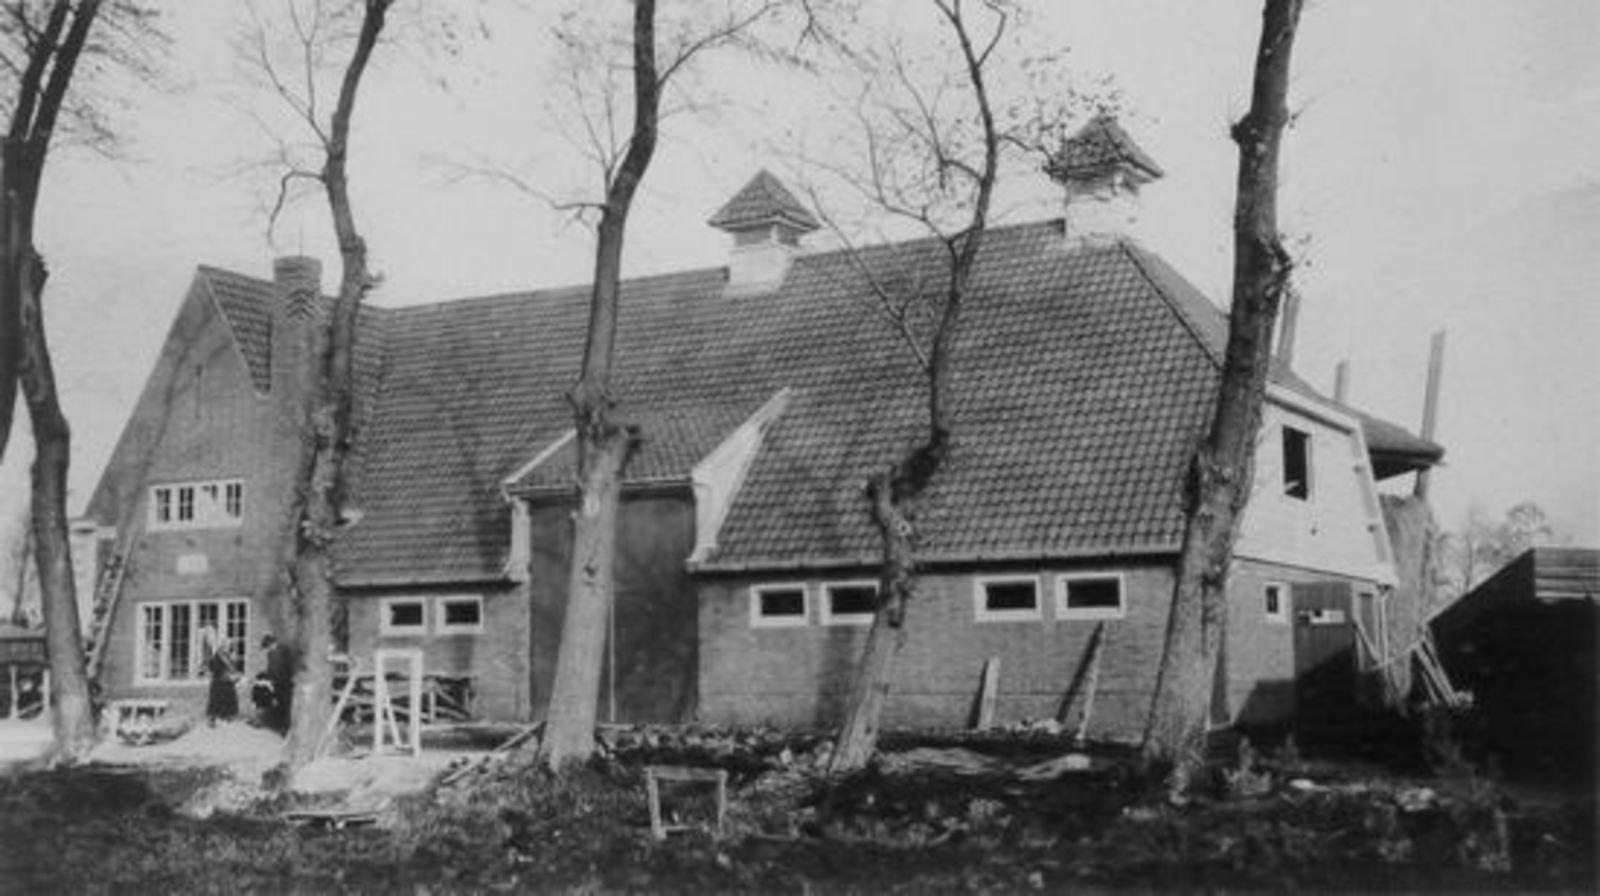 Cruquiusdijk 0095 1925± Paulina Agneta Hoeve 02